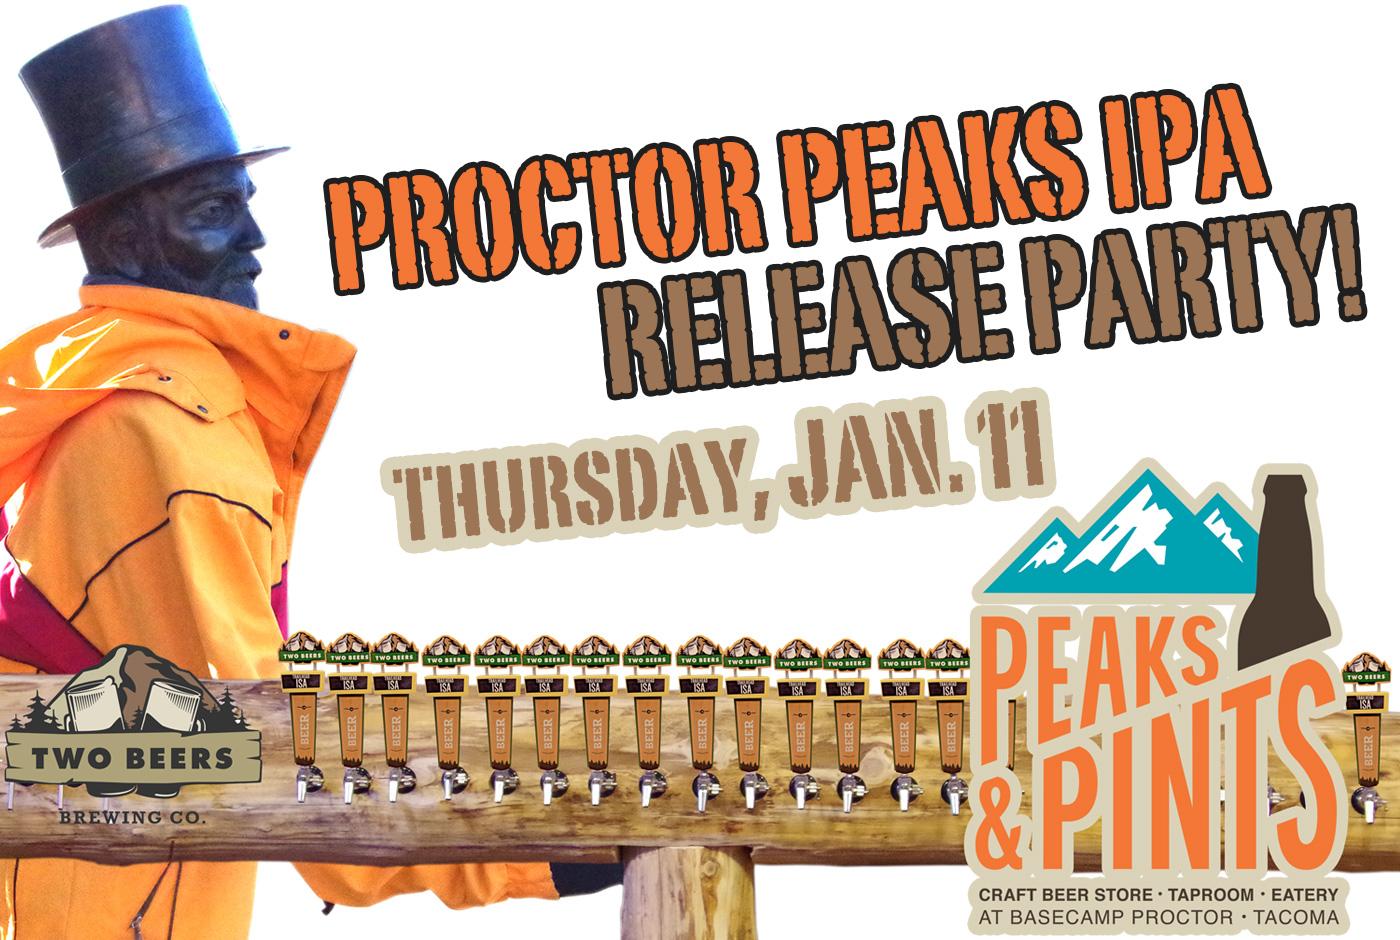 Proctor-Peaks-IPA-Release-Party-calendar